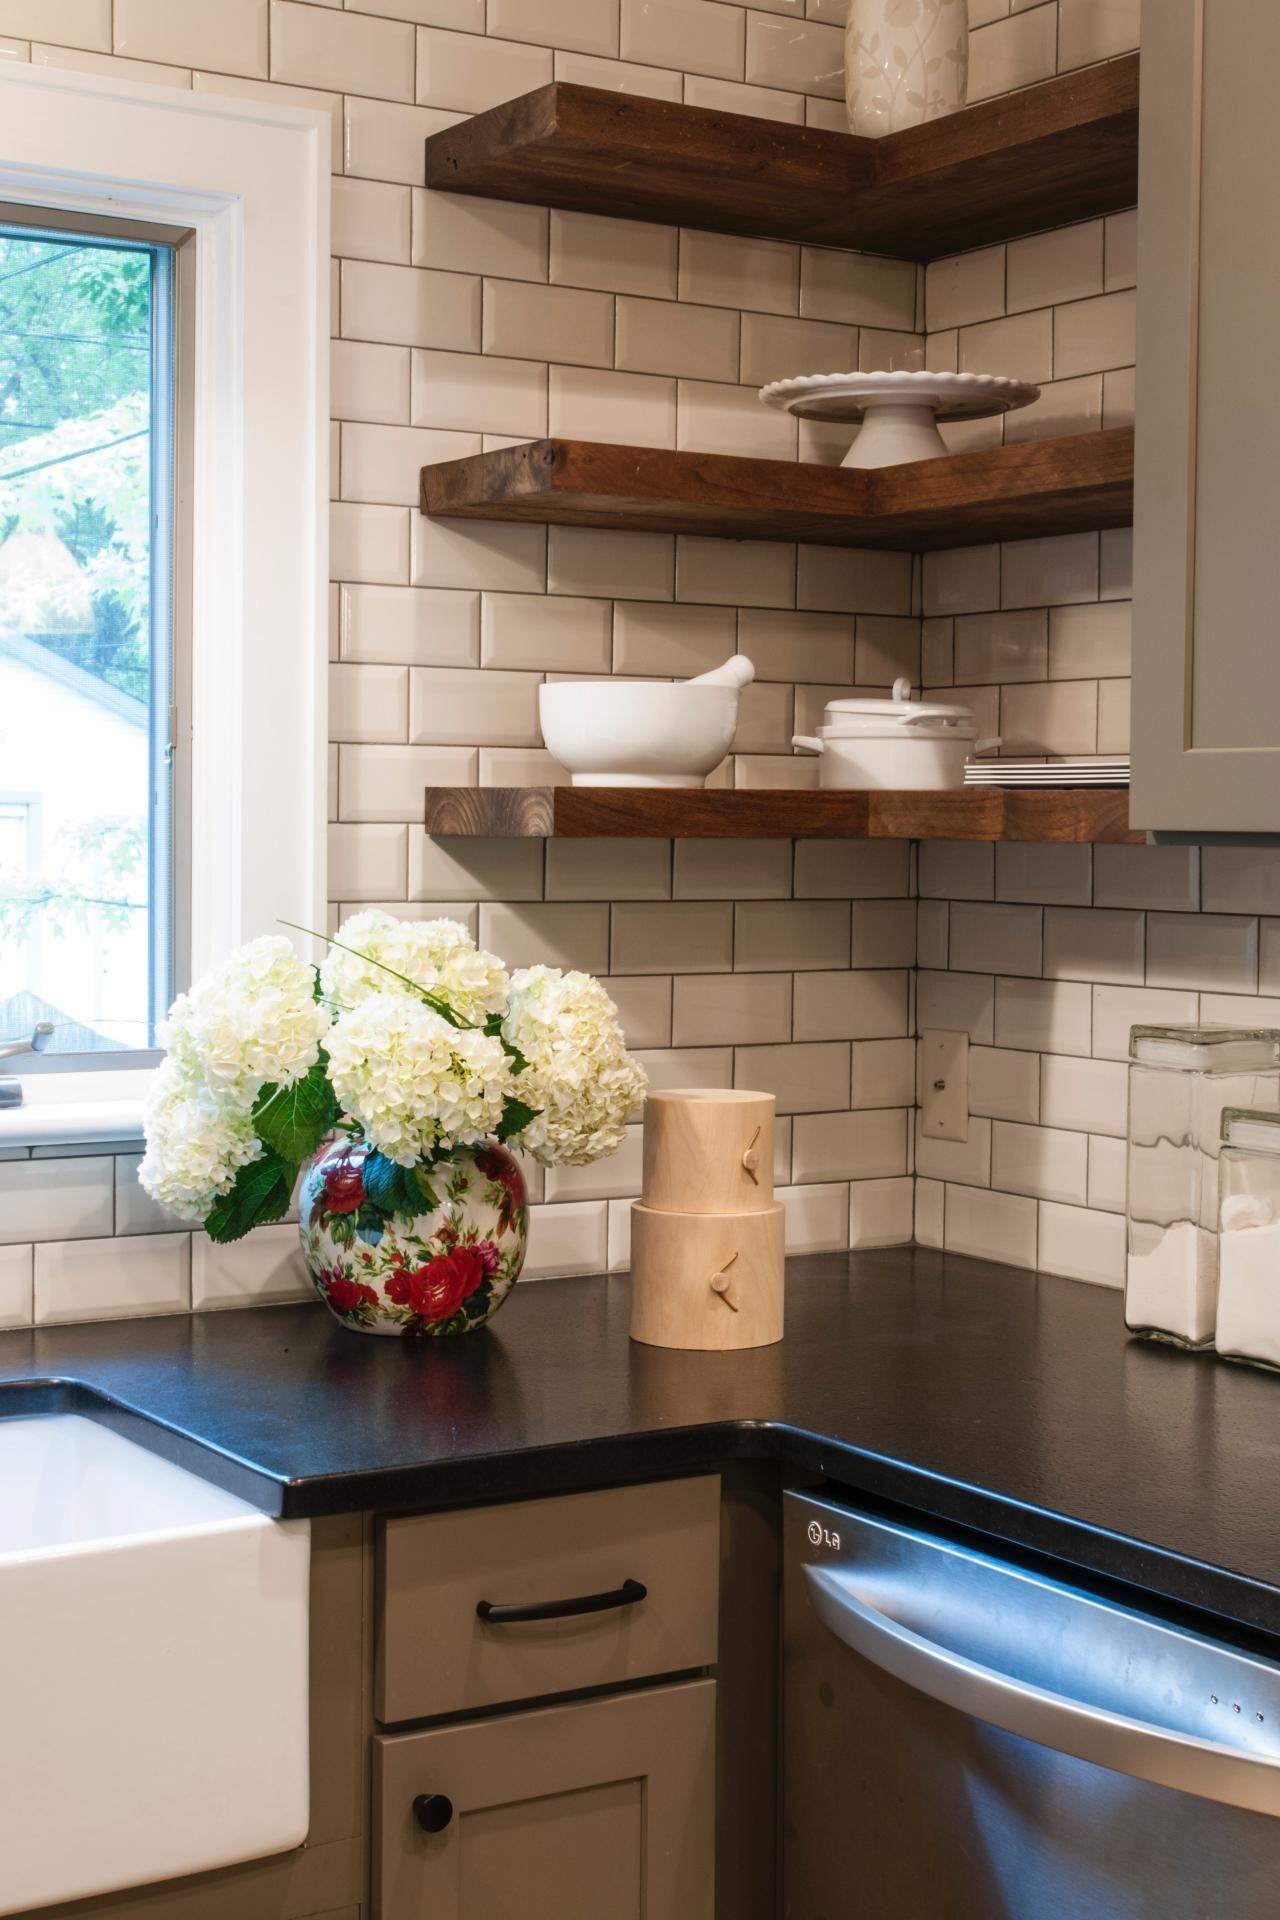 Subway Tile Kitchen Backsplash   Basement kitchen   Pinterest ...